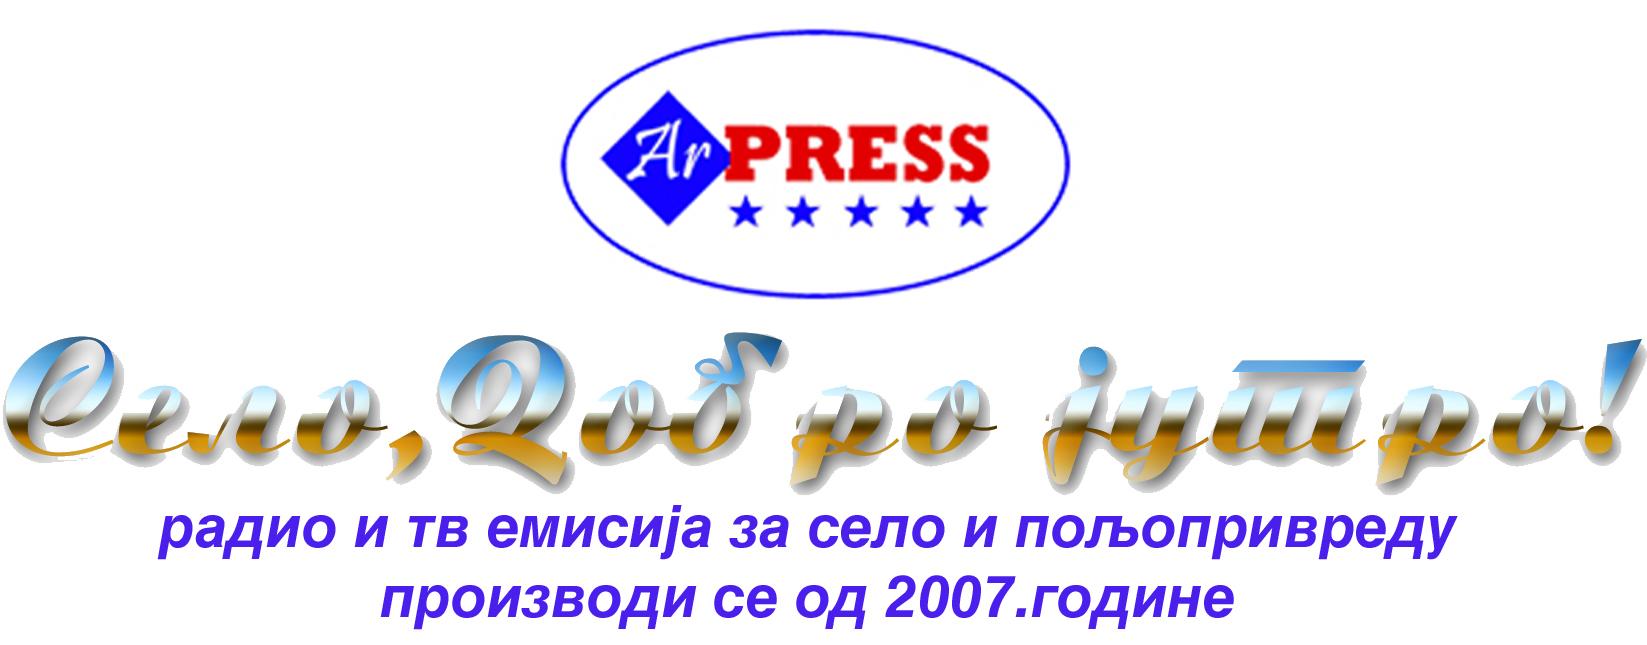 Logo Ar PRESS 2016